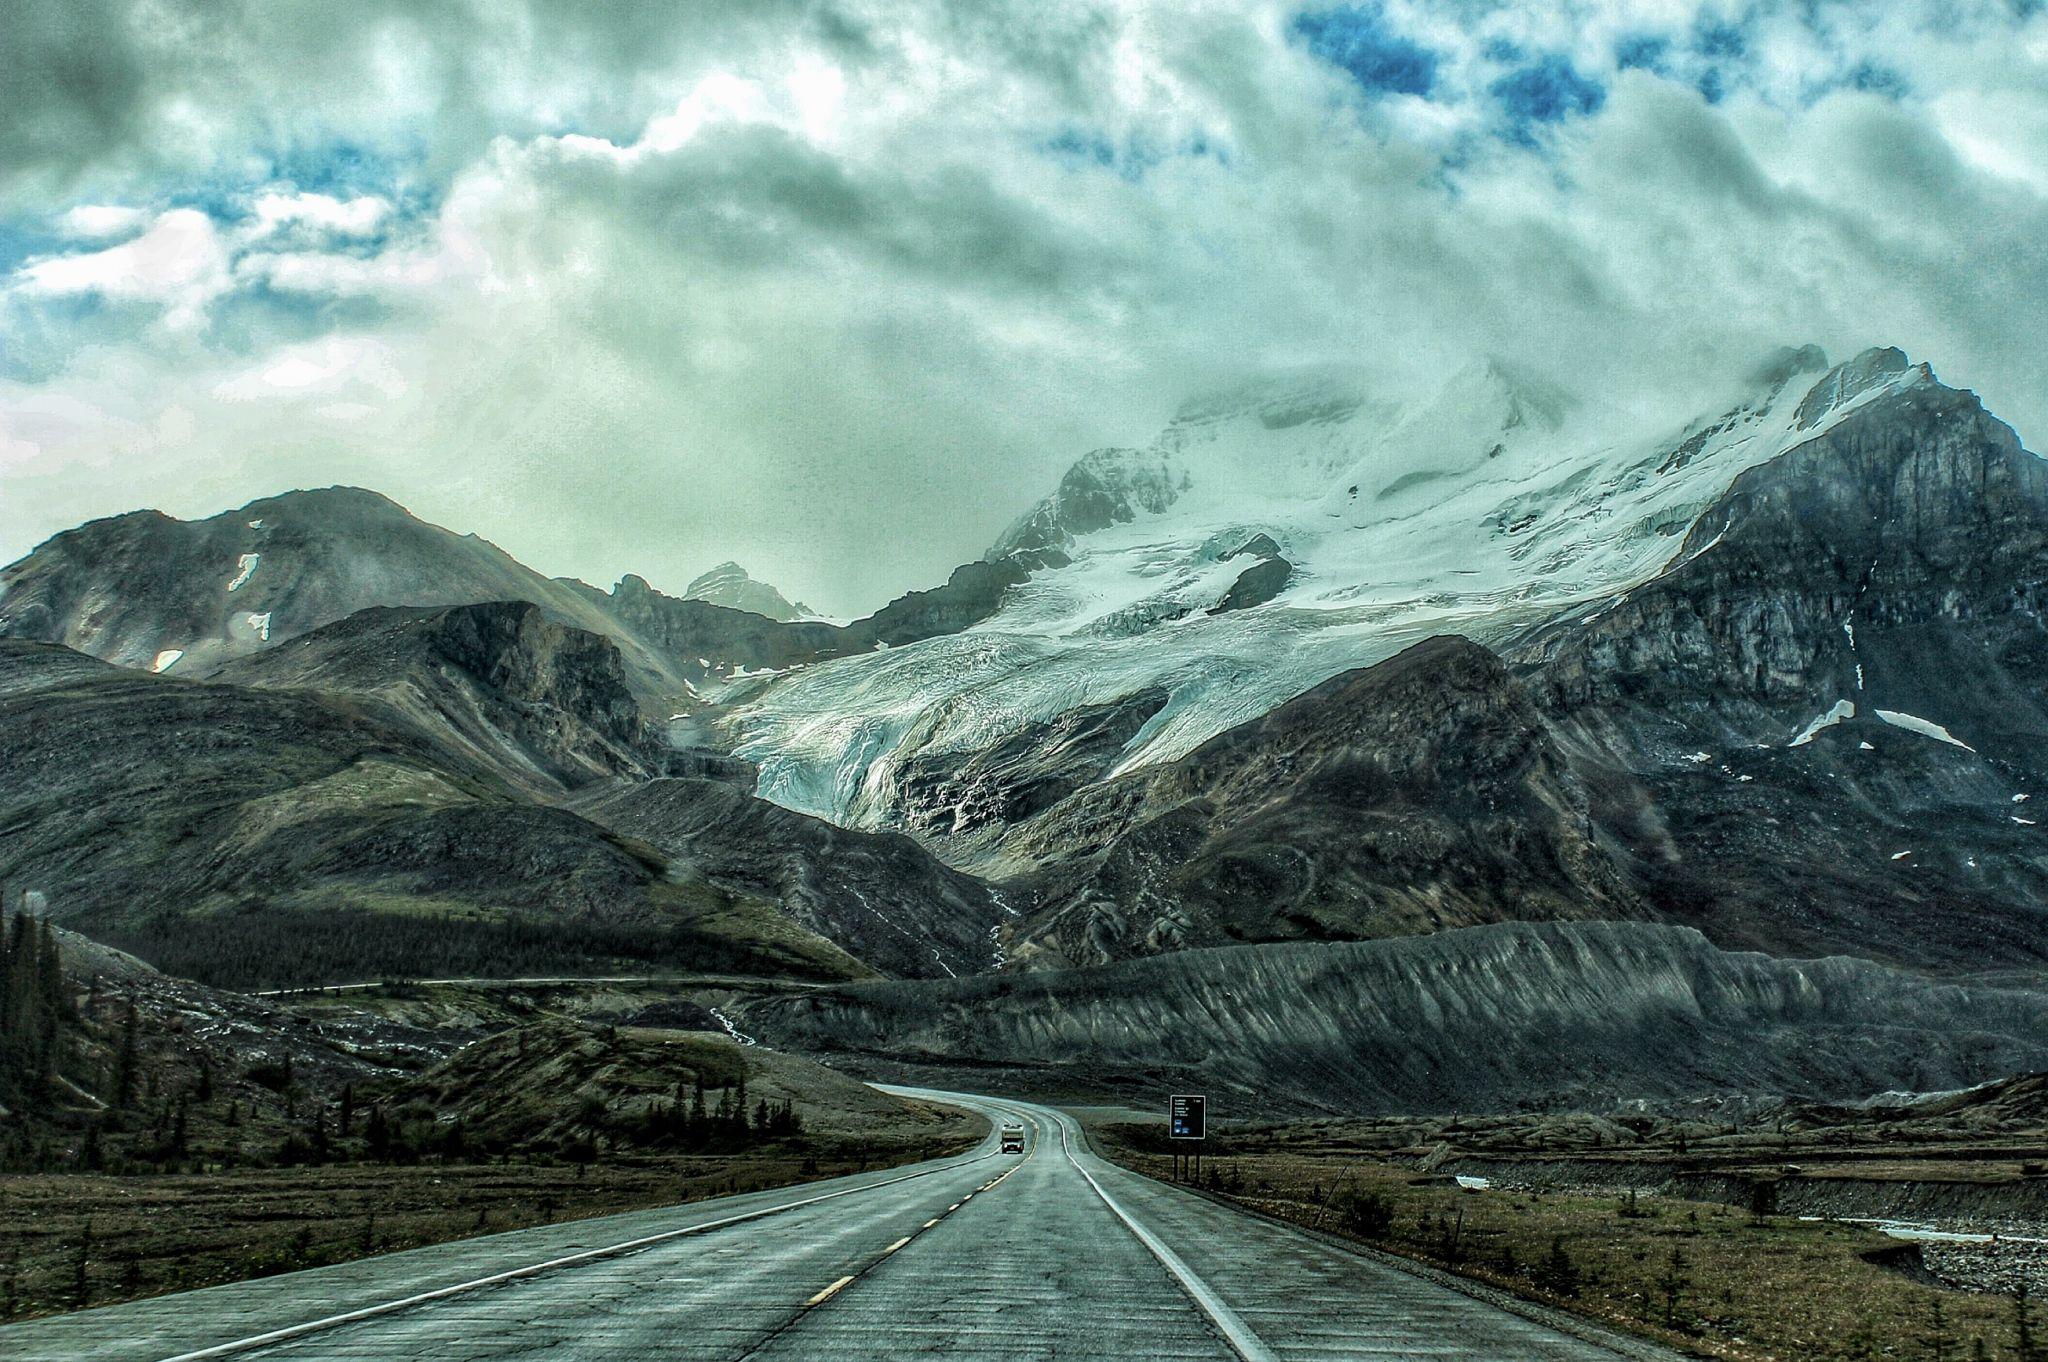 Mt. Athabasca, Canada